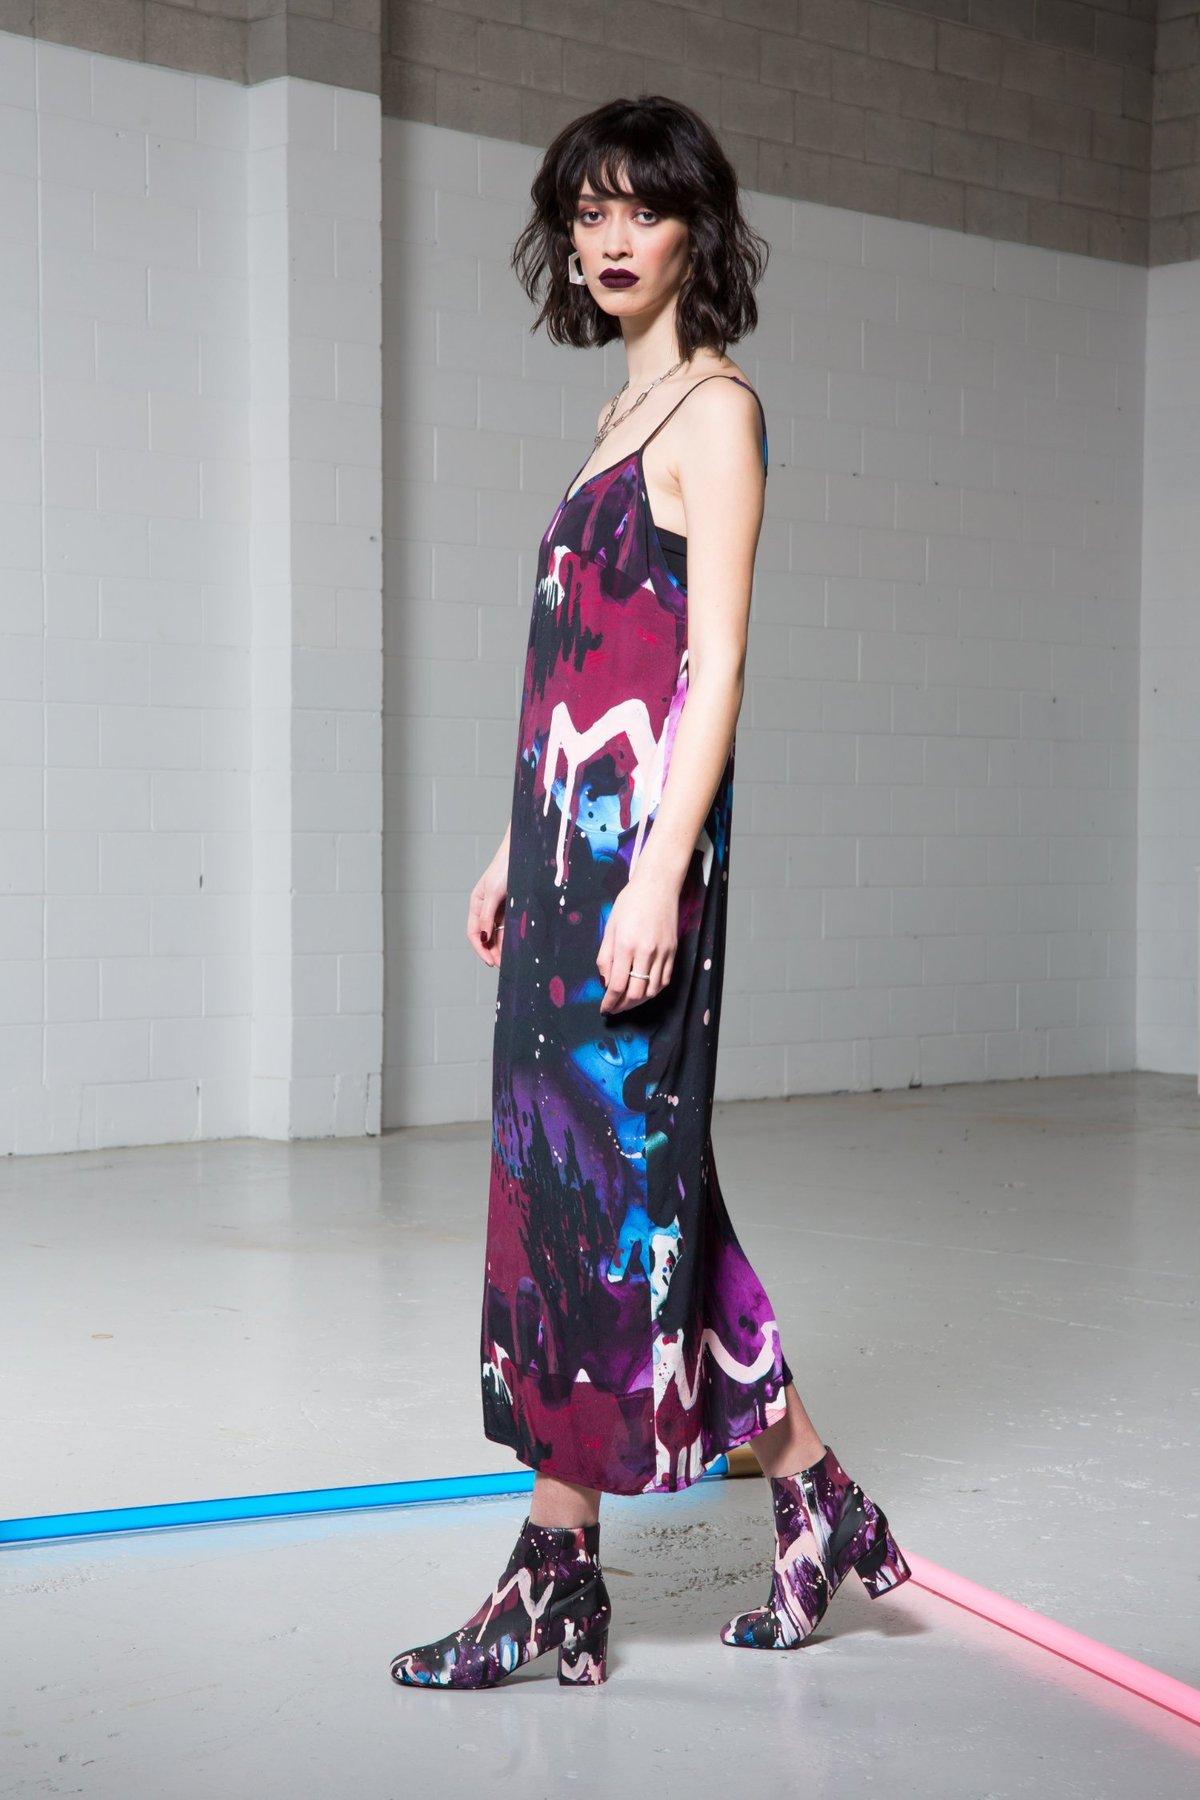 paper_dress_5_1800x1800.jpg